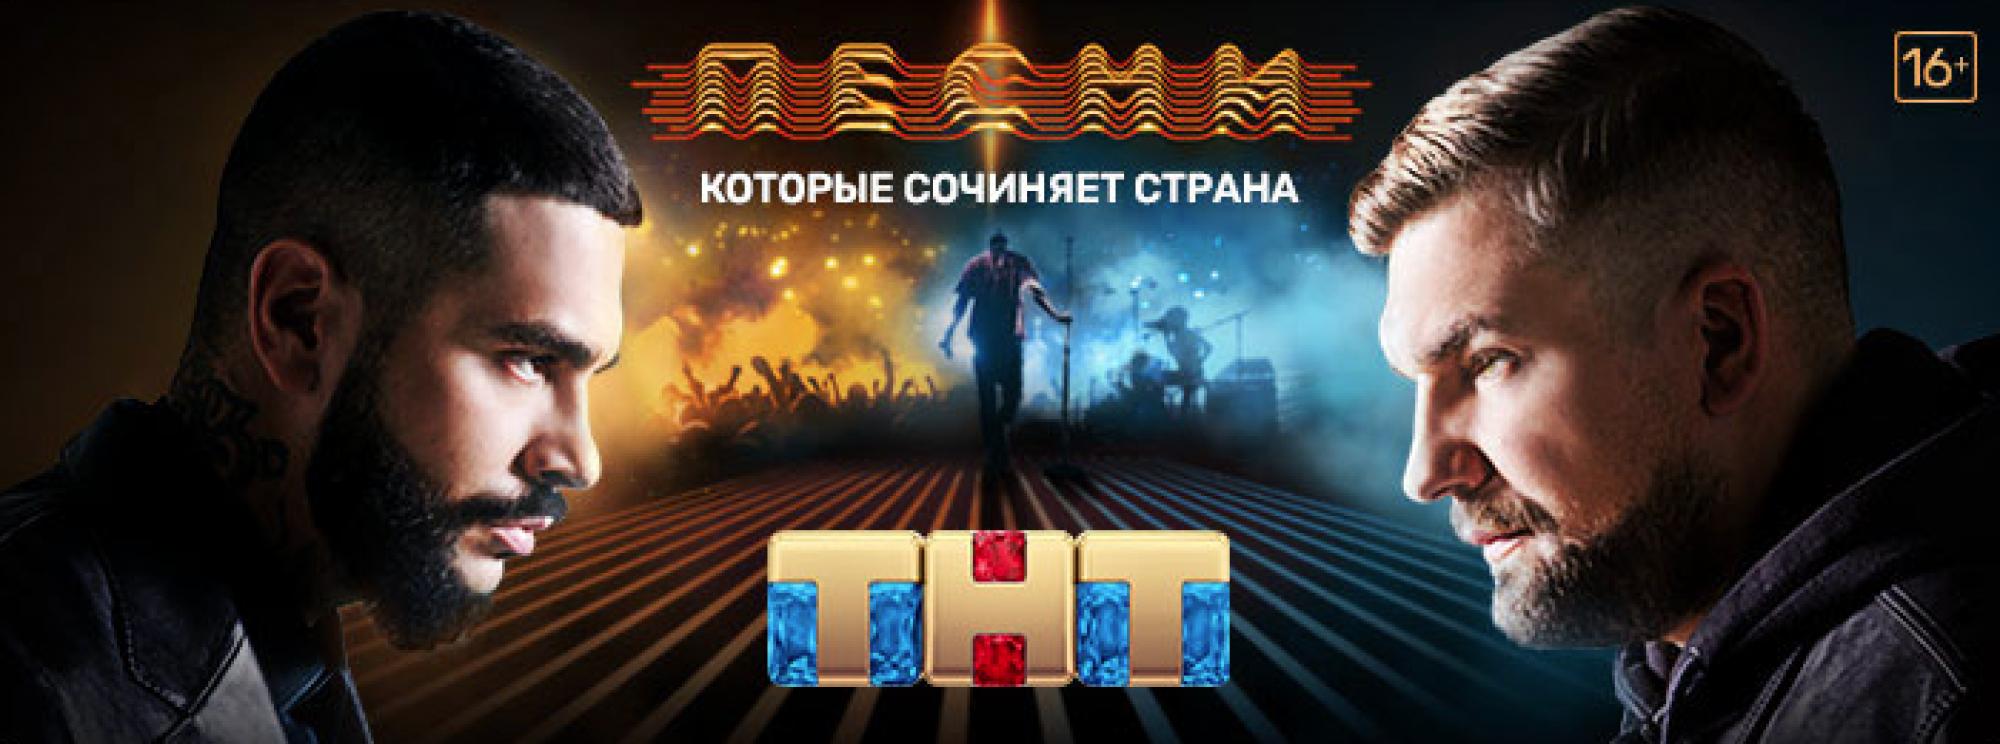 Третий сезон проекта «Песни» стартует на «ТНТ» в феврале